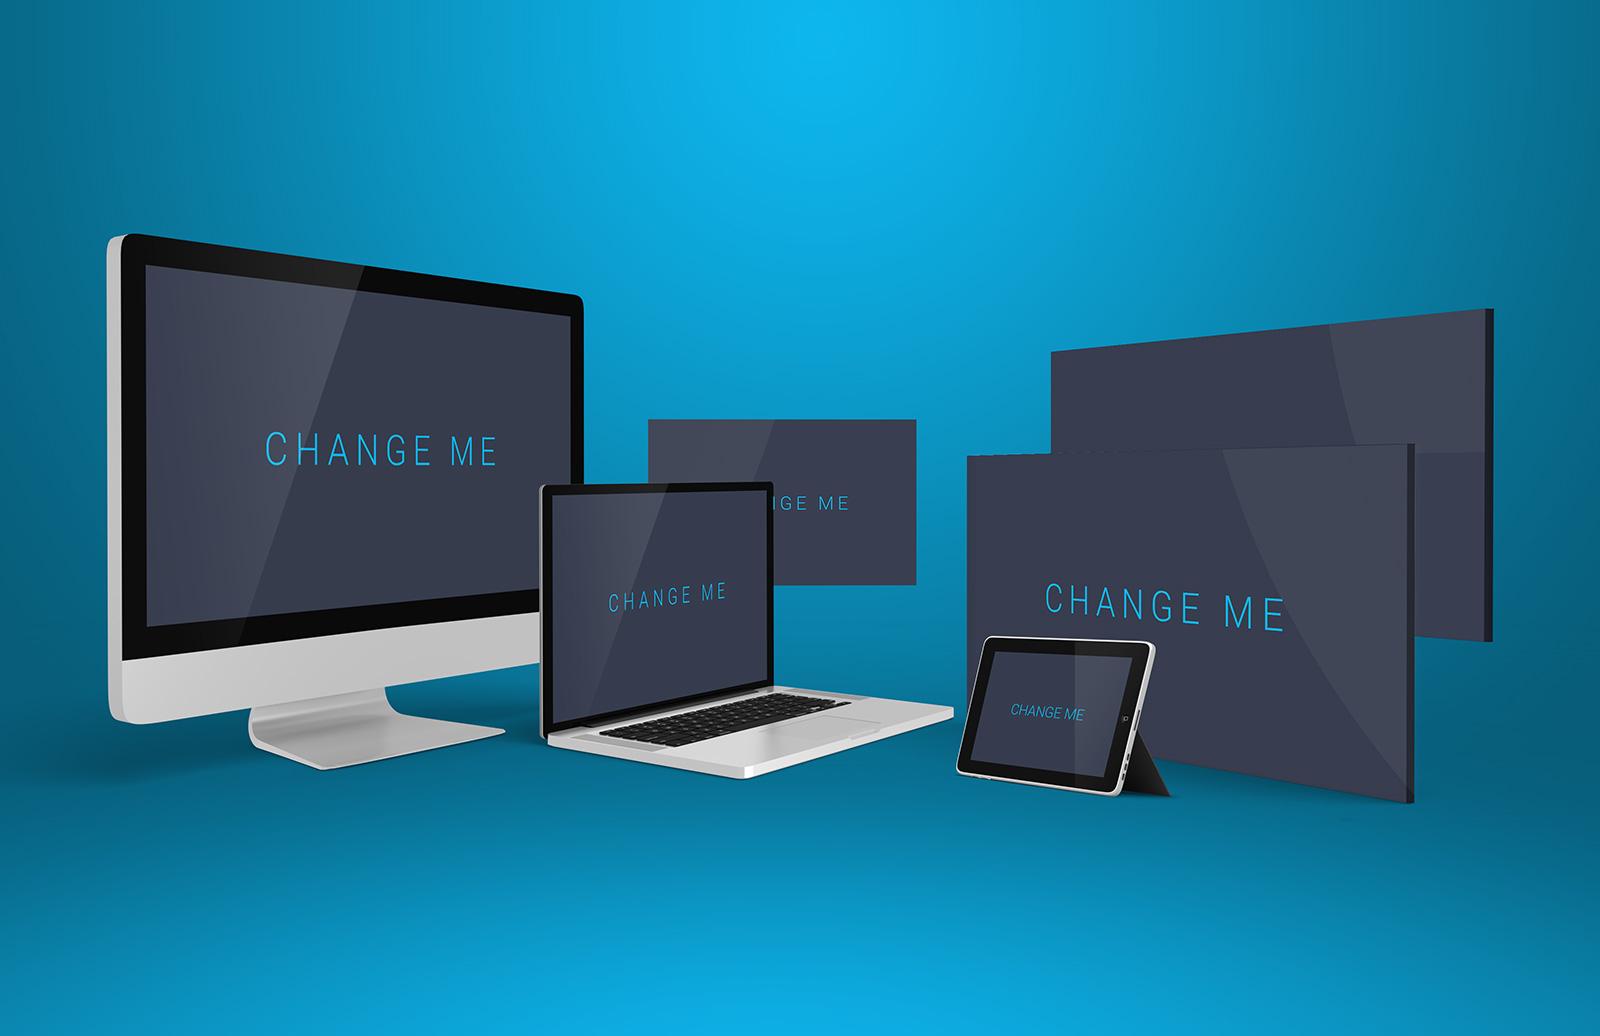 Free-Responsive-Website-Application-Showcase-Mockup-PSD